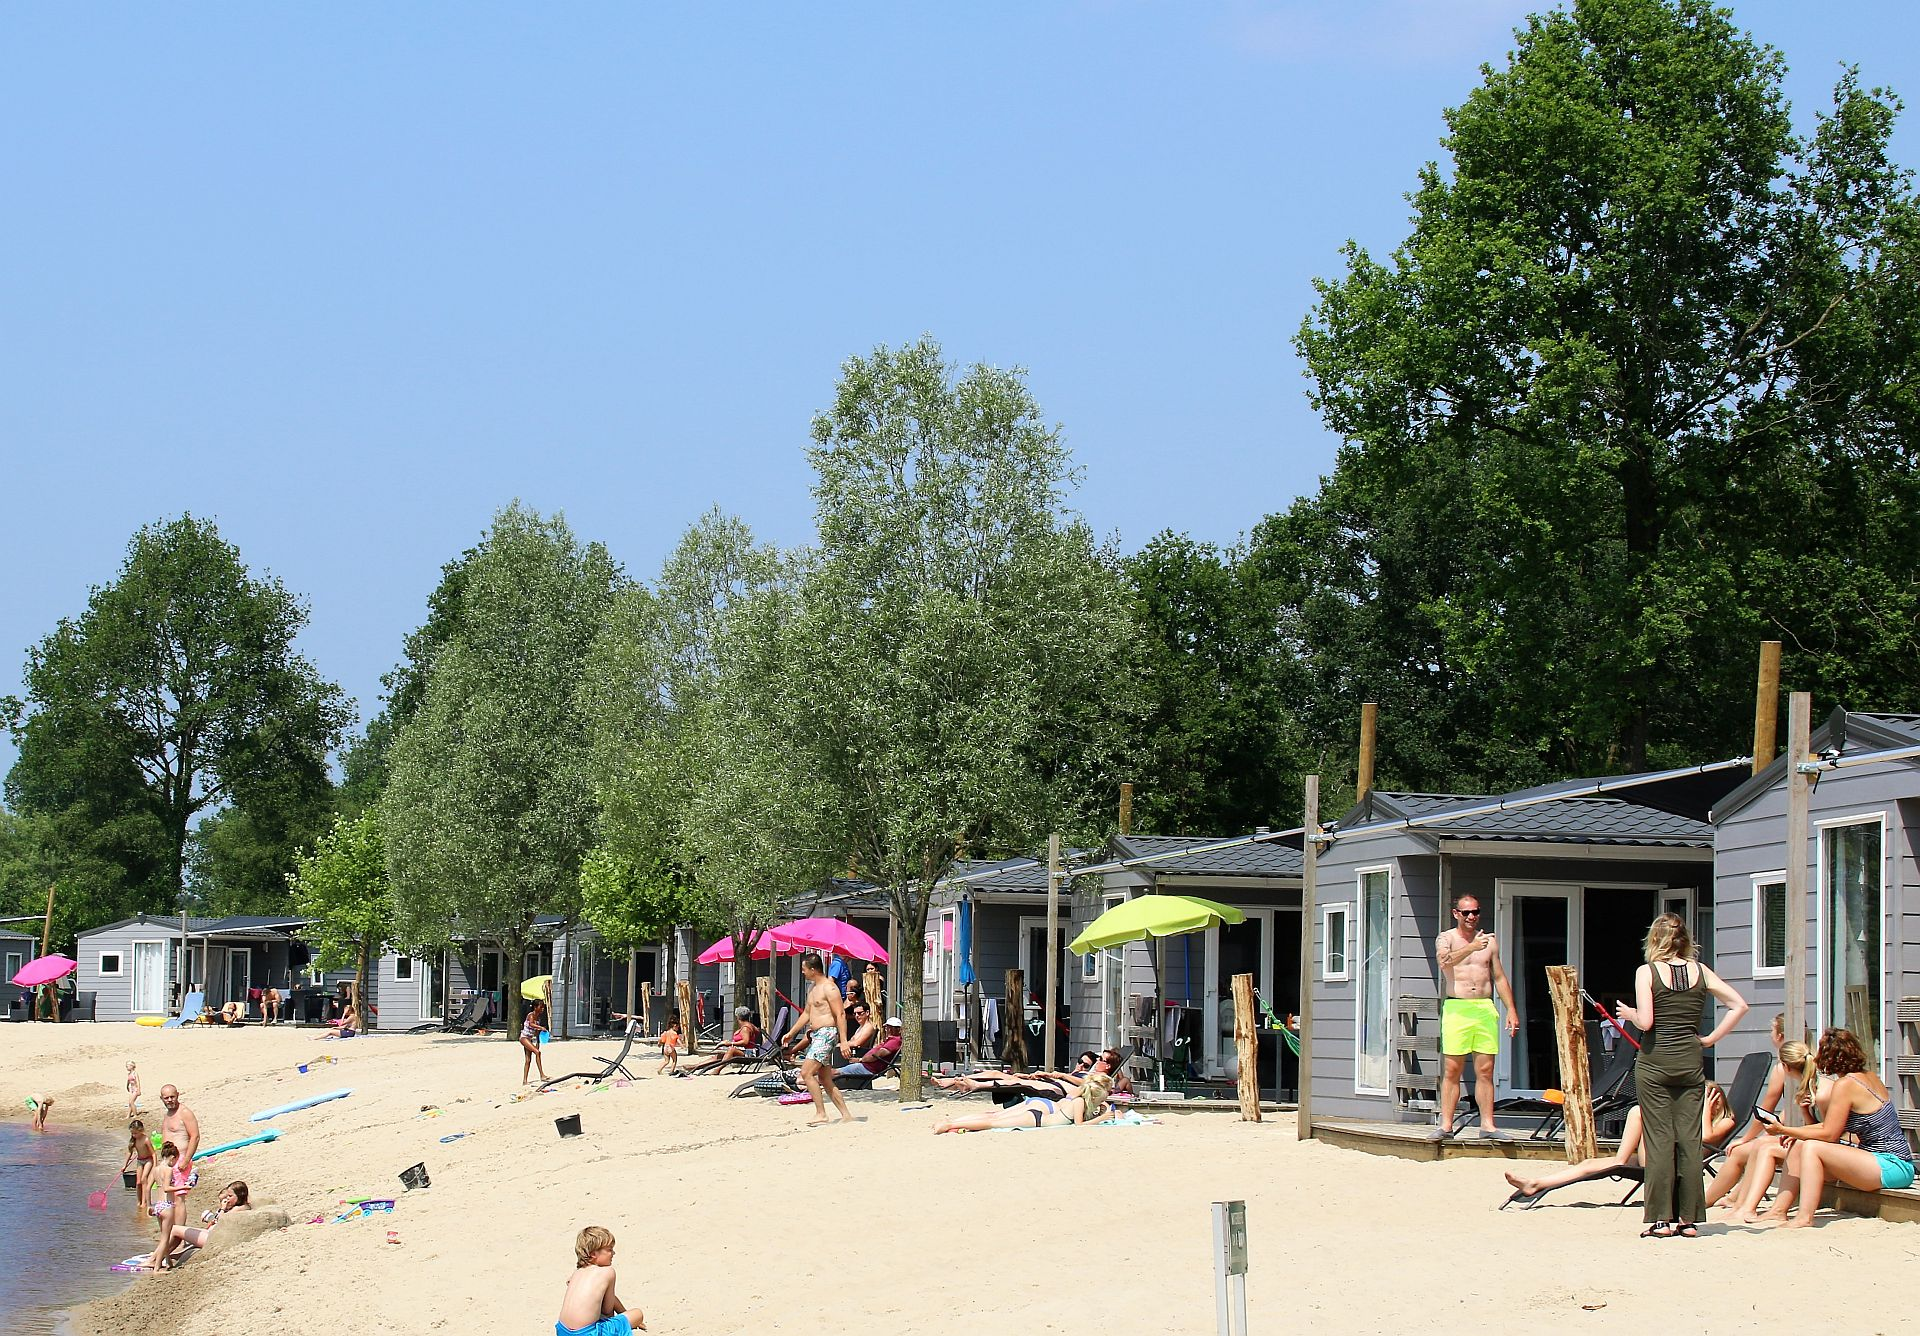 Vakantie in Overijssel - vakantie in Overijssel